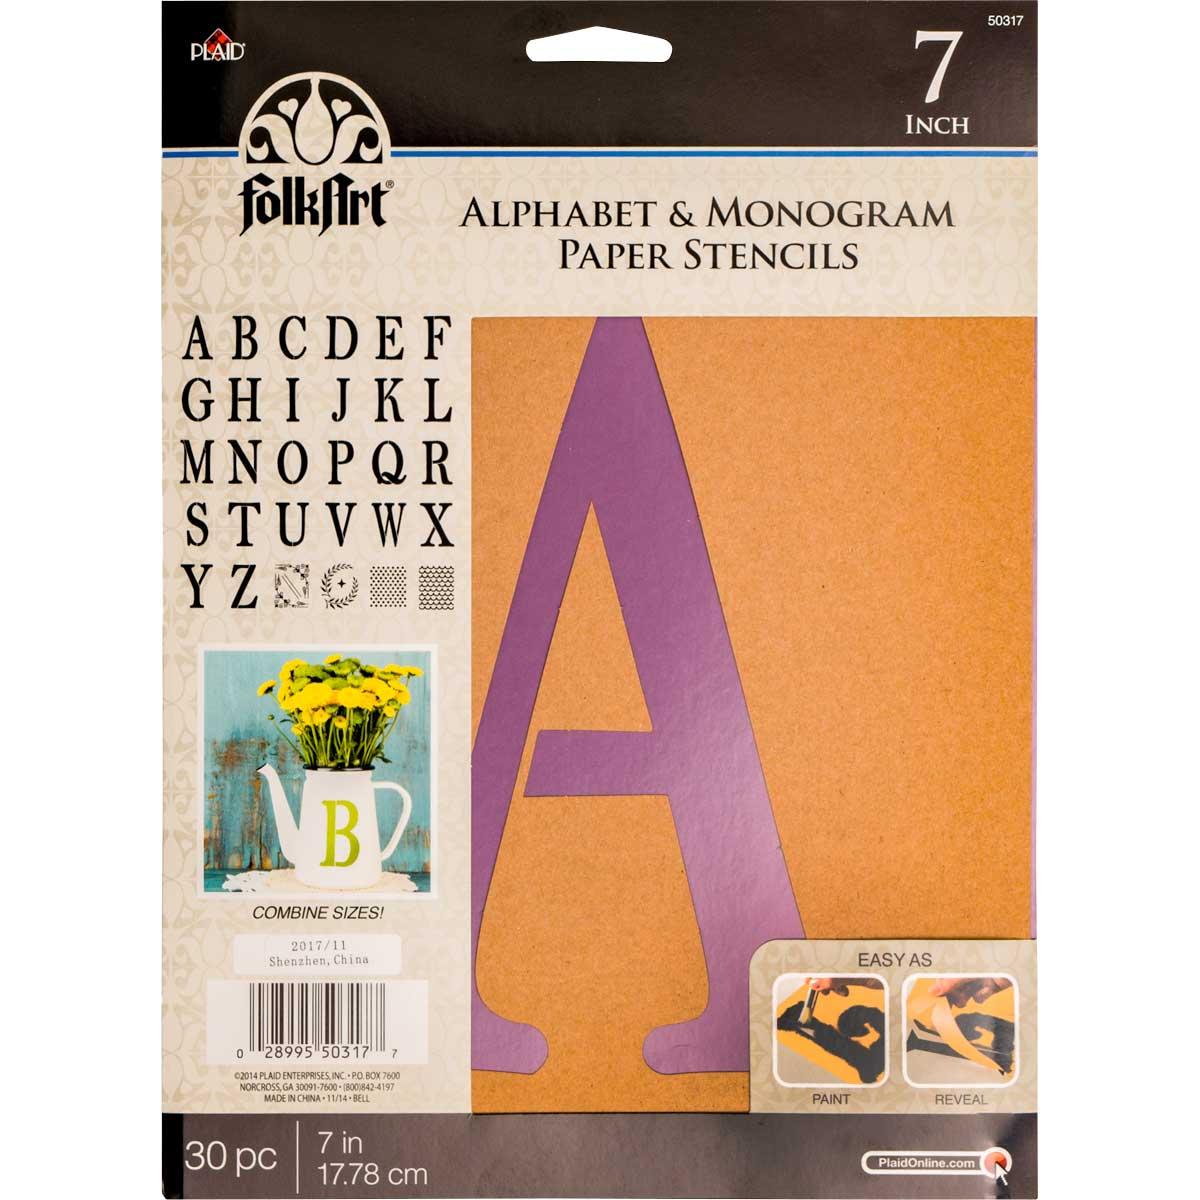 FolkArt ® Alphabet & Monogram Paper Stencils - Serif Font, 7